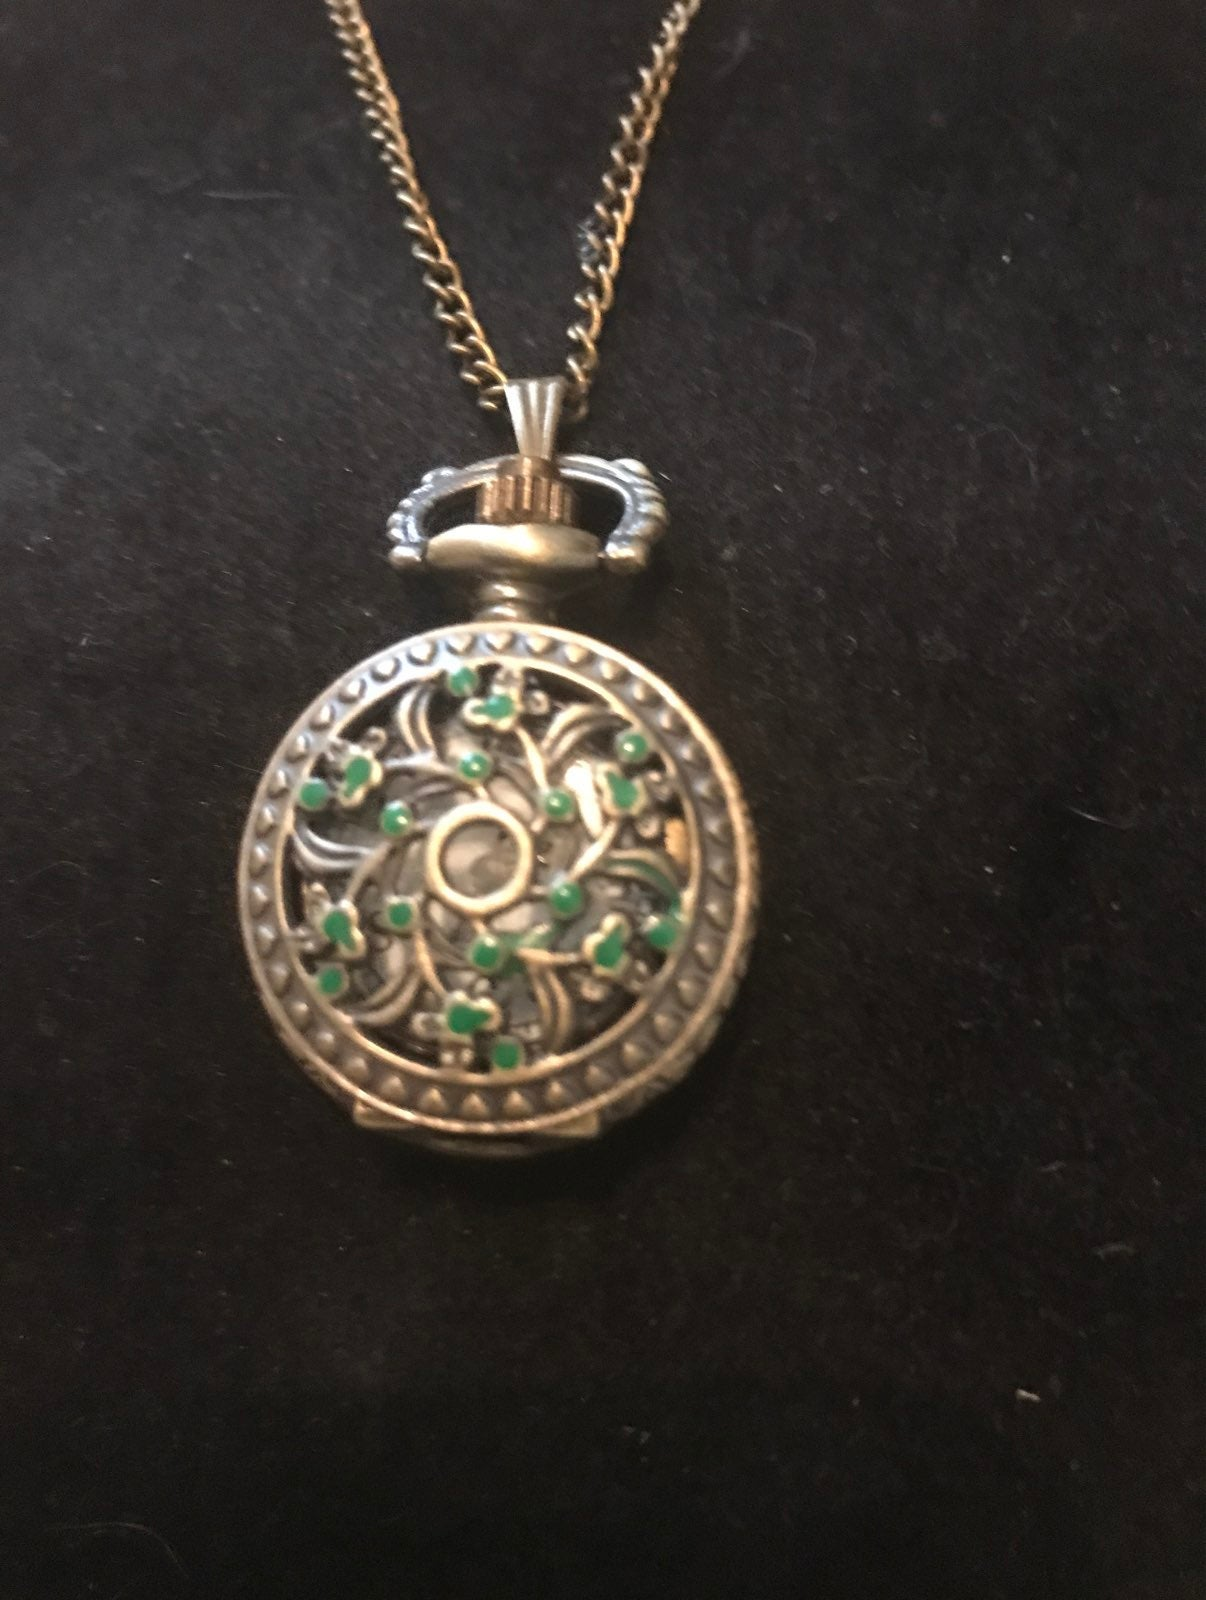 Women's vintage pendant watch